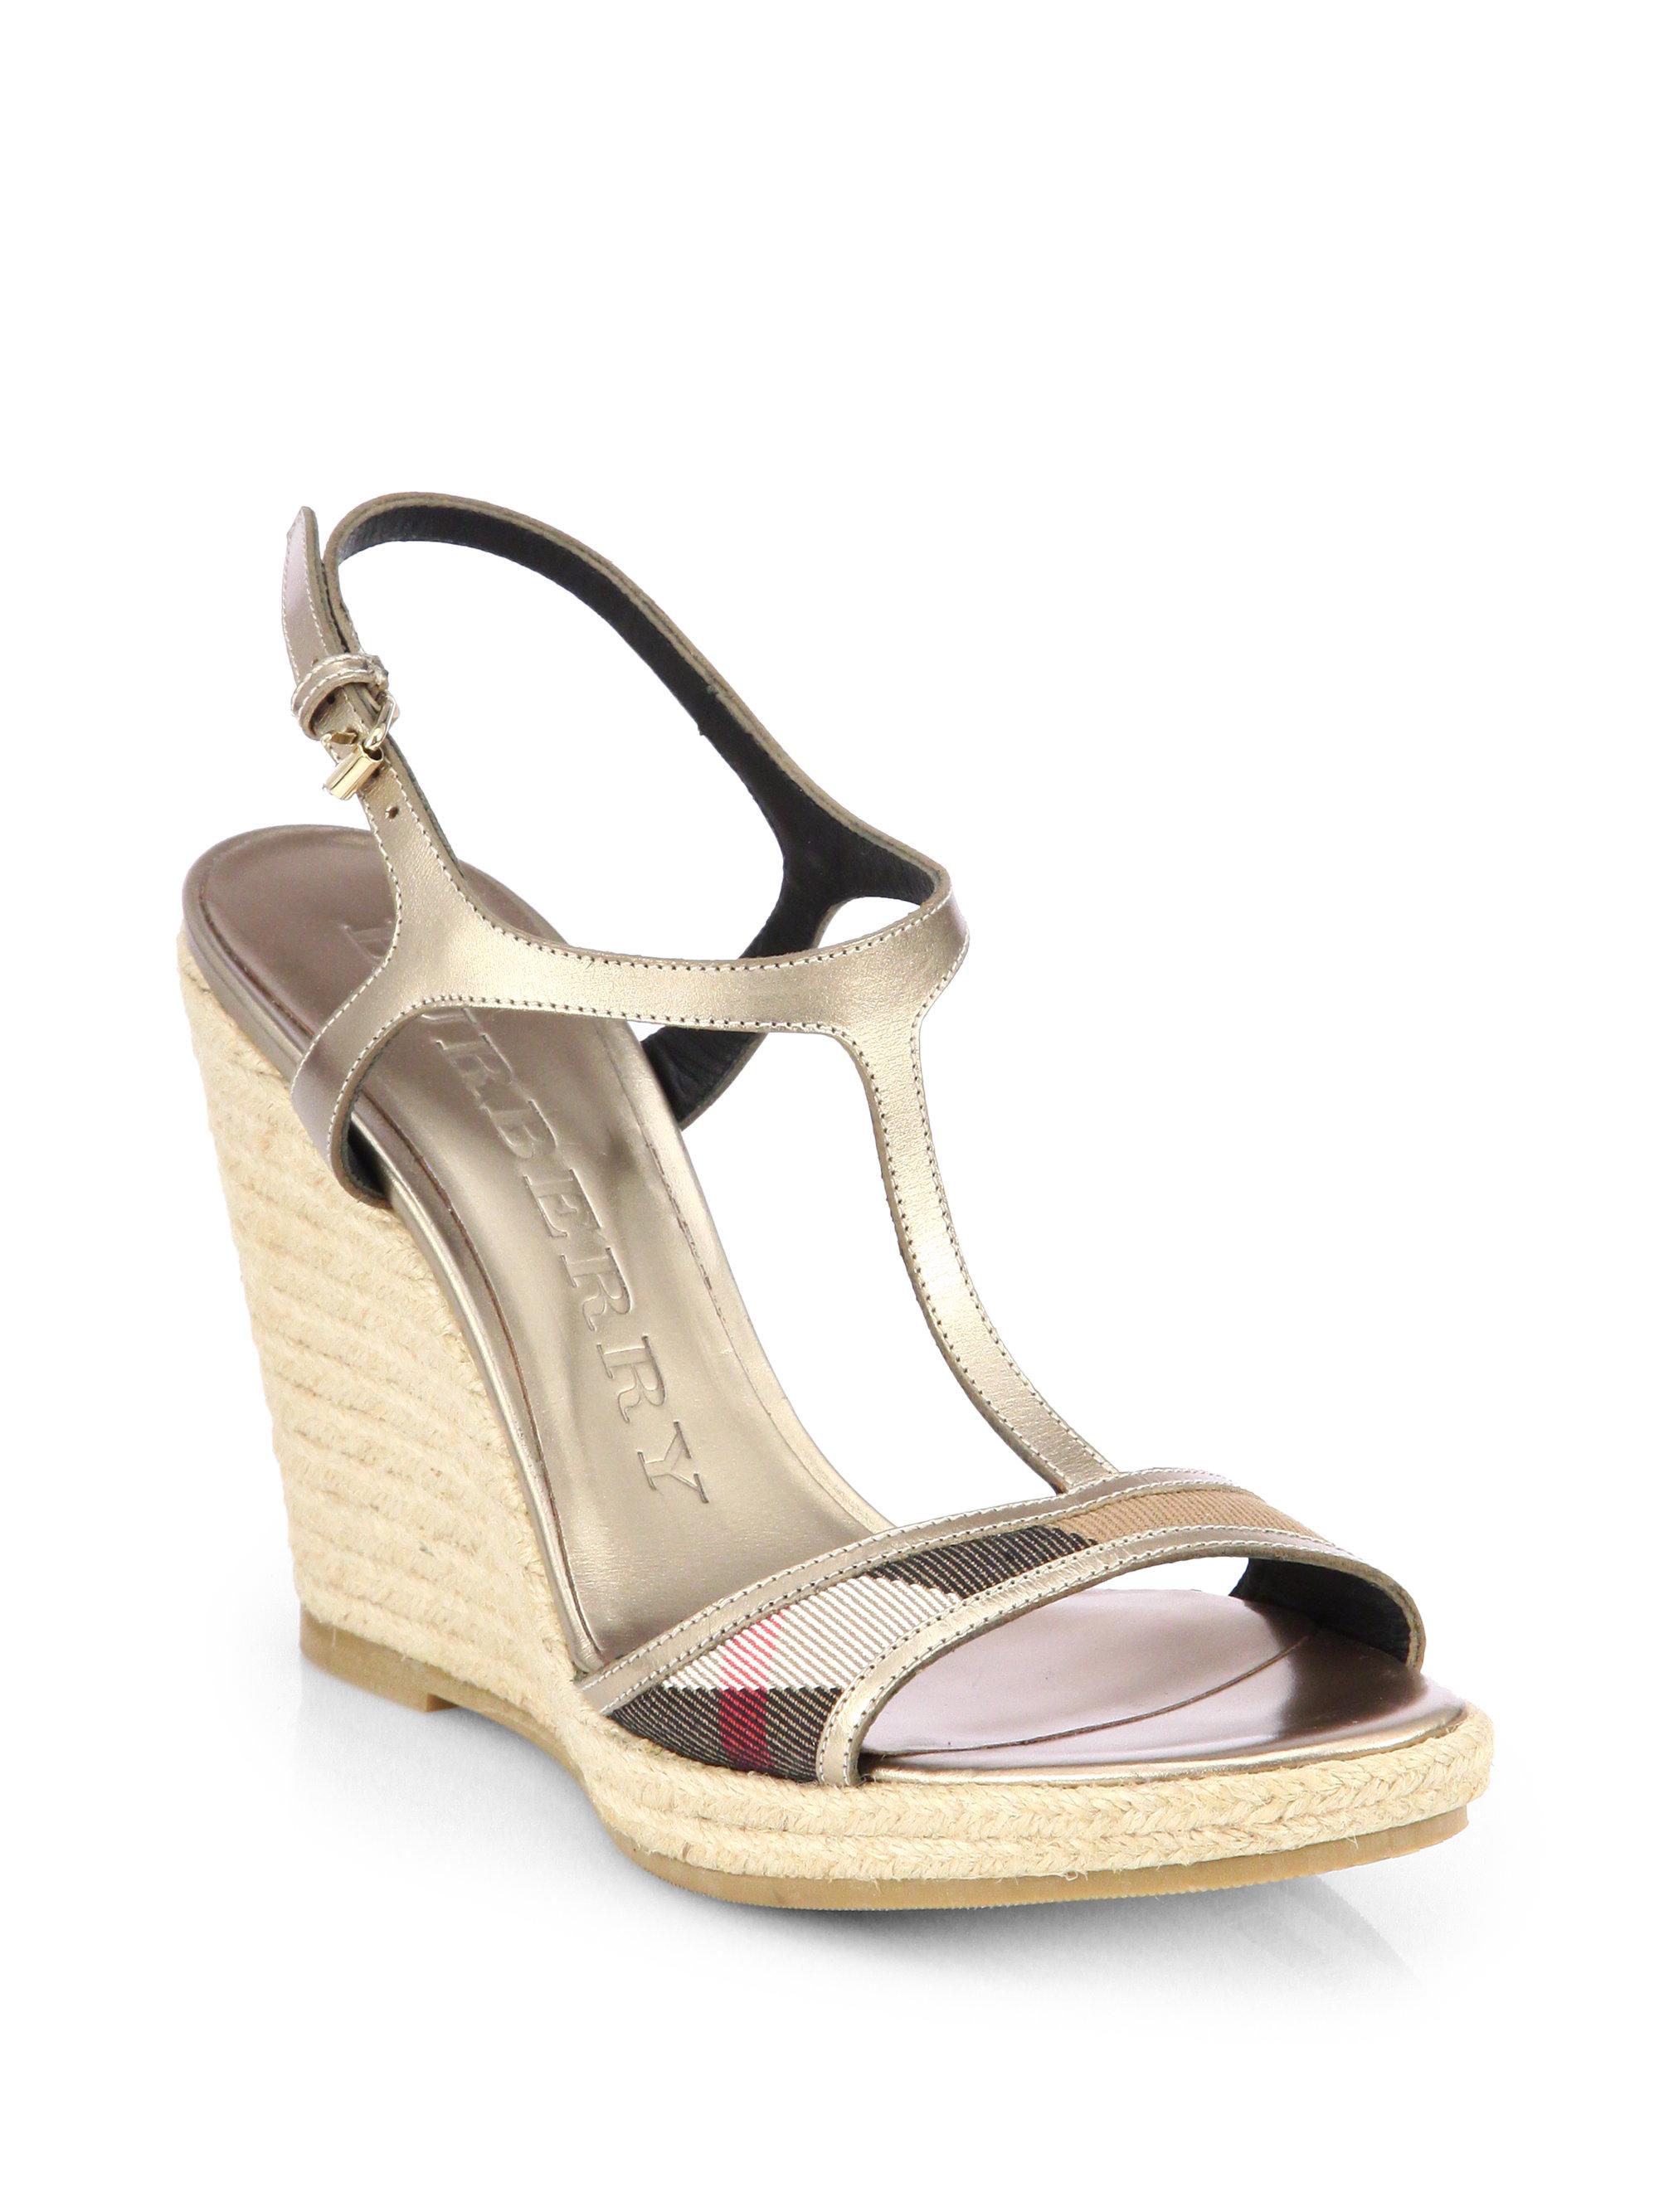 Burberry Leeham Metallic Leather Canvas Wedge Sandals In